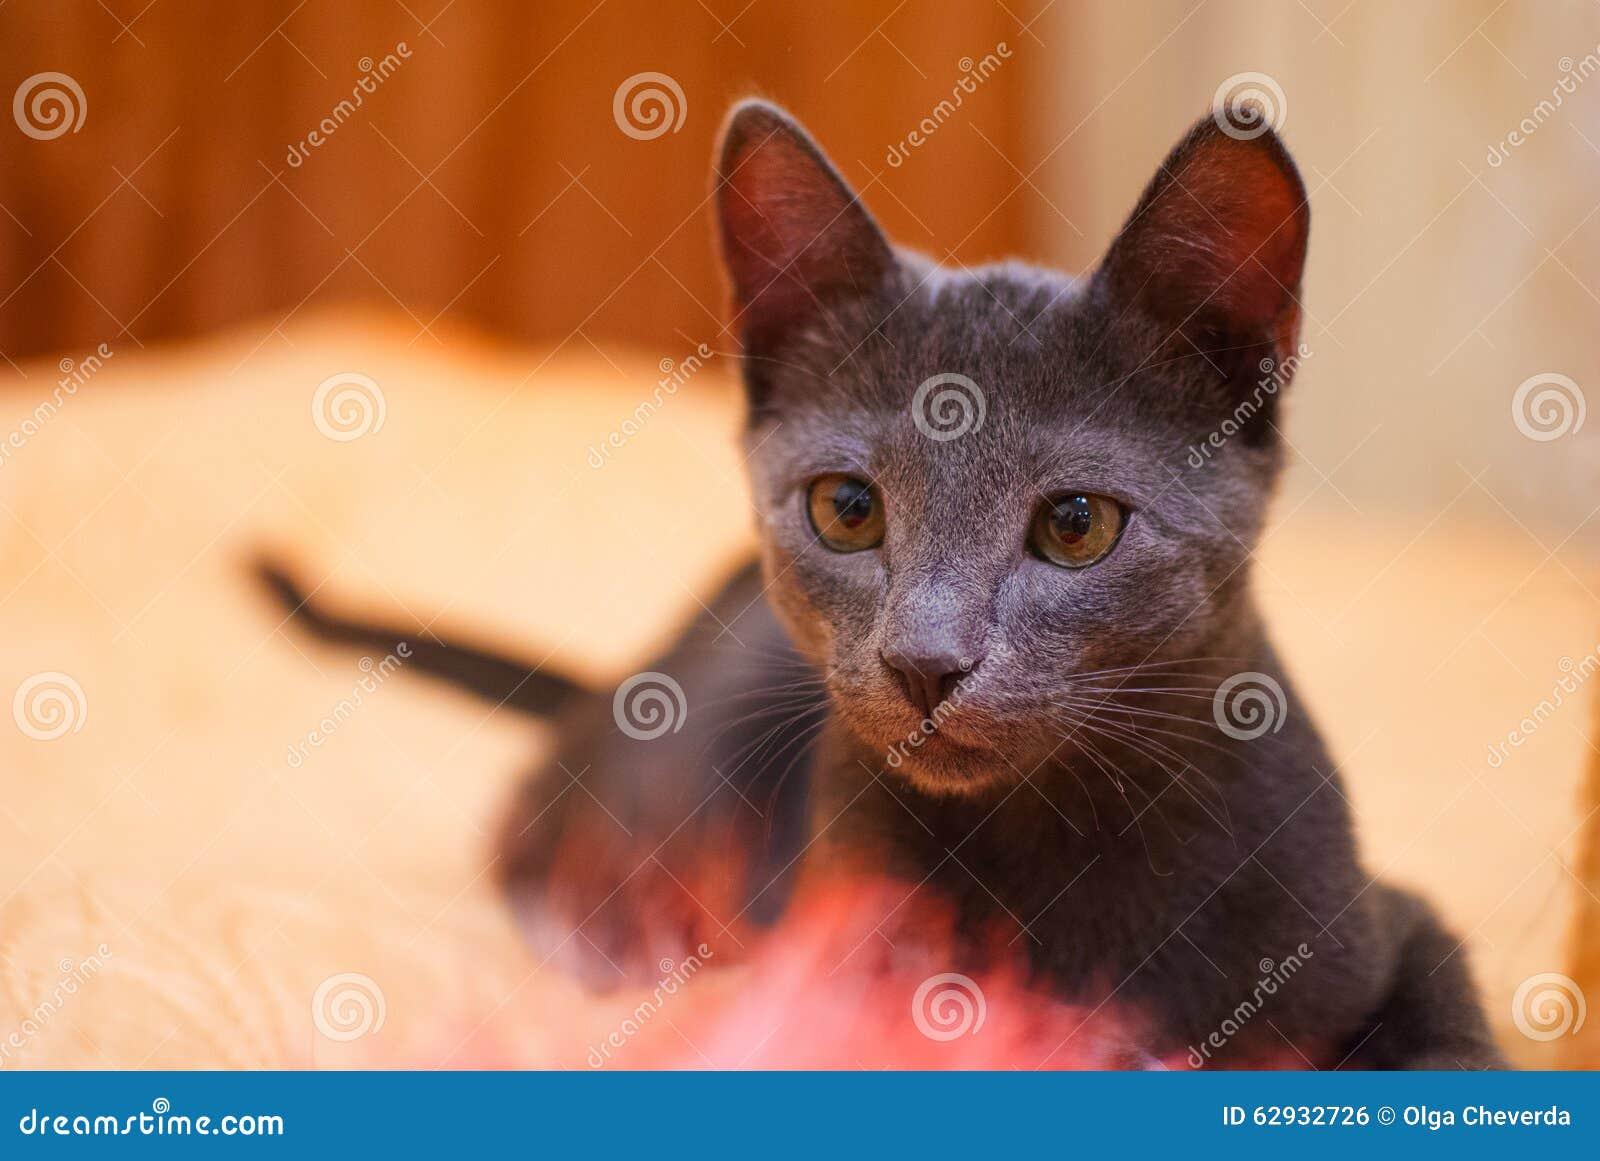 black wild cats